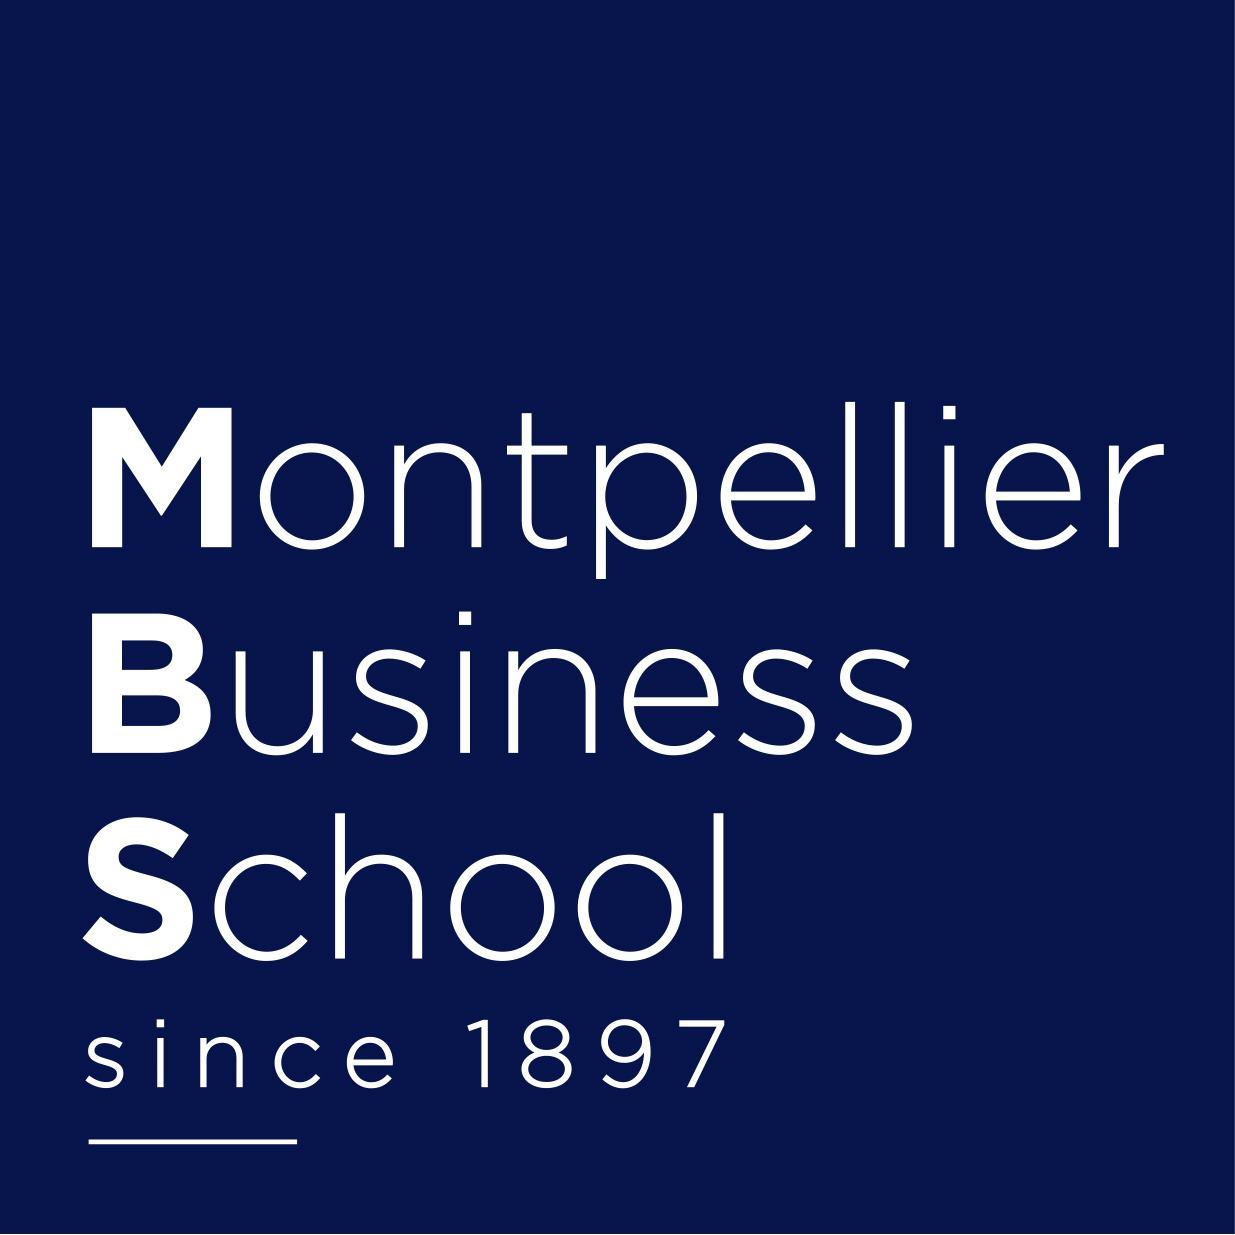 the MONTPELLIER BUSINESS SCHOOL logo.